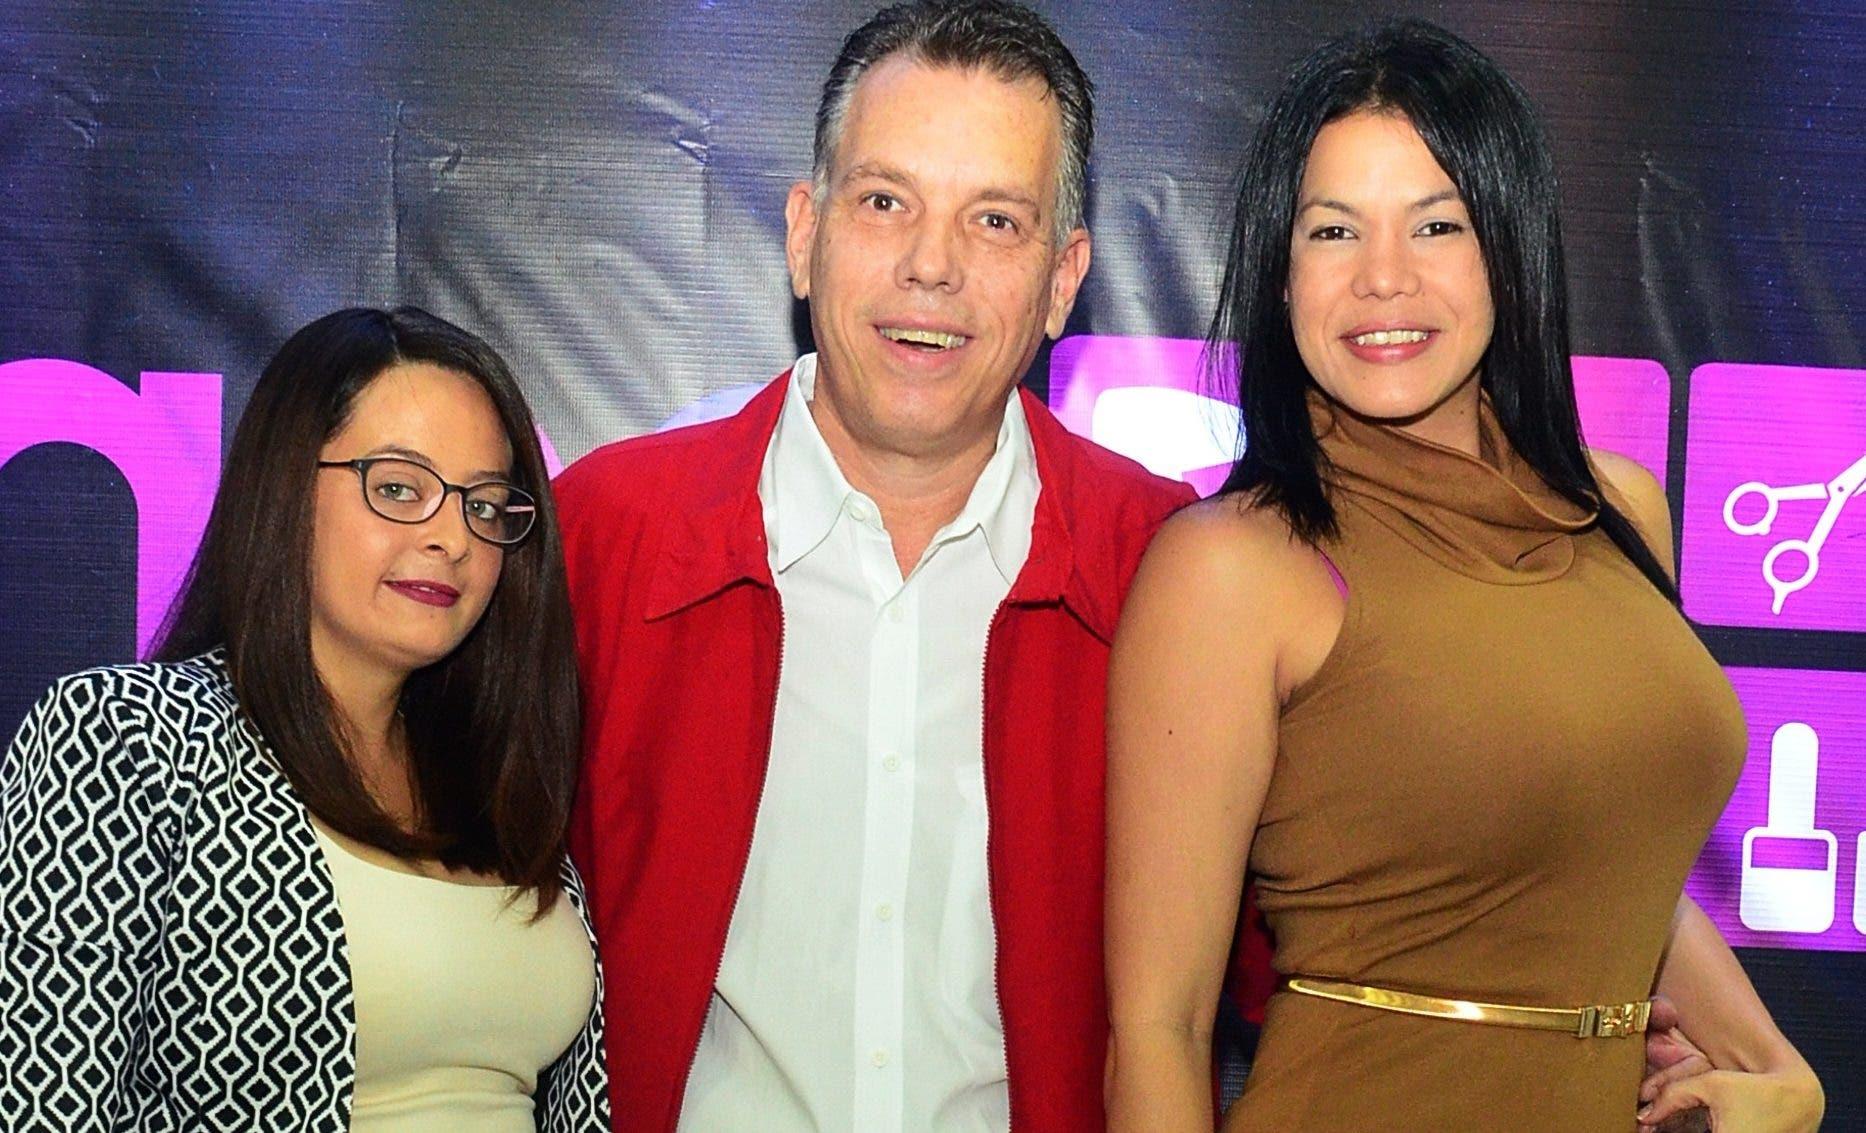 Joanna Vincent, Pablo Barcarola y Jisseell Santana.